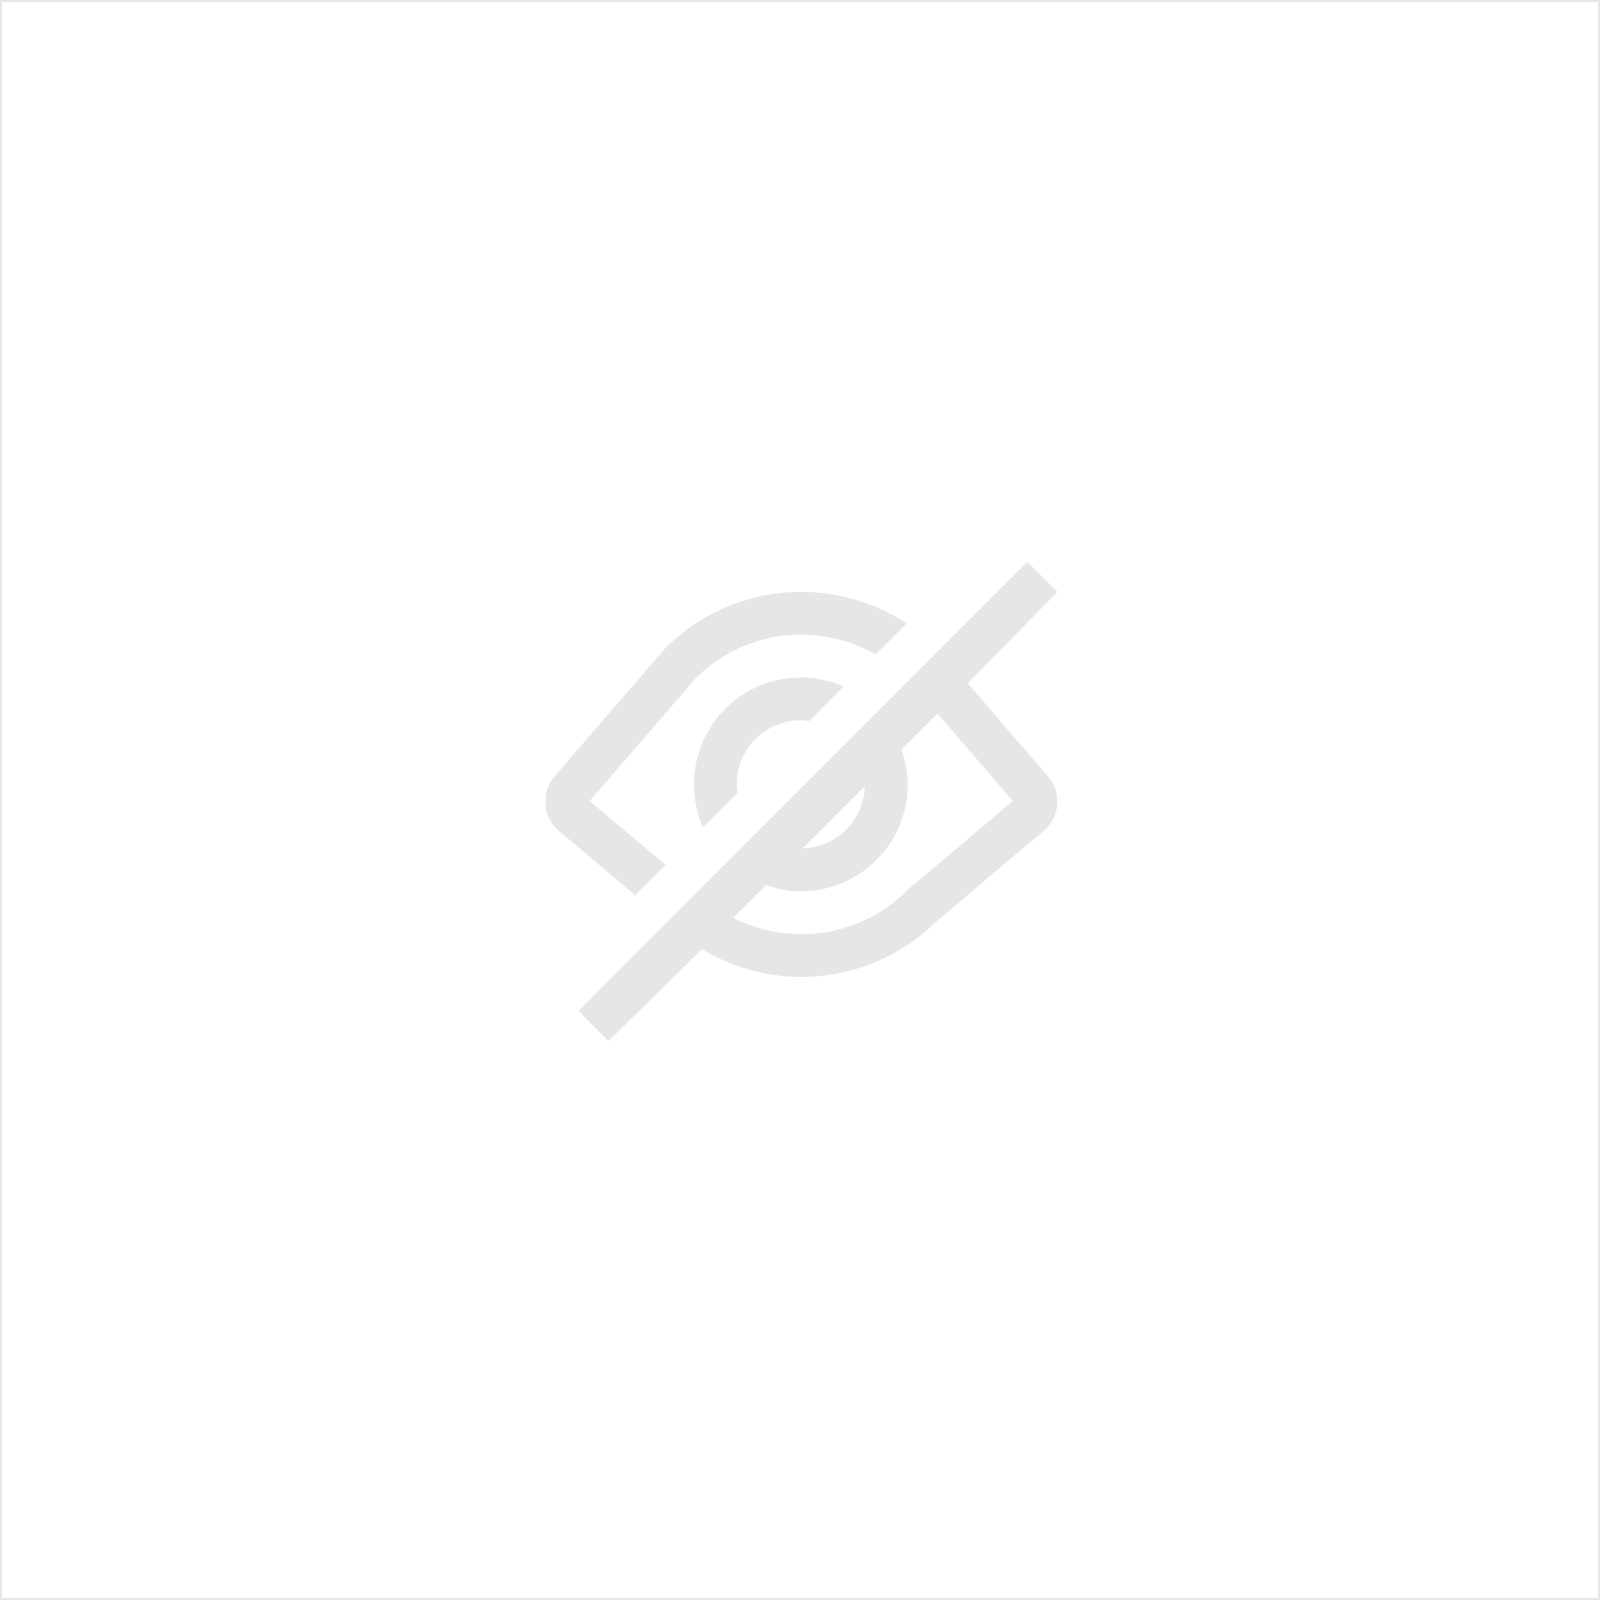 WERKPLAATSMEUBEL GSW-COMBI-35PLUS - IMOLA